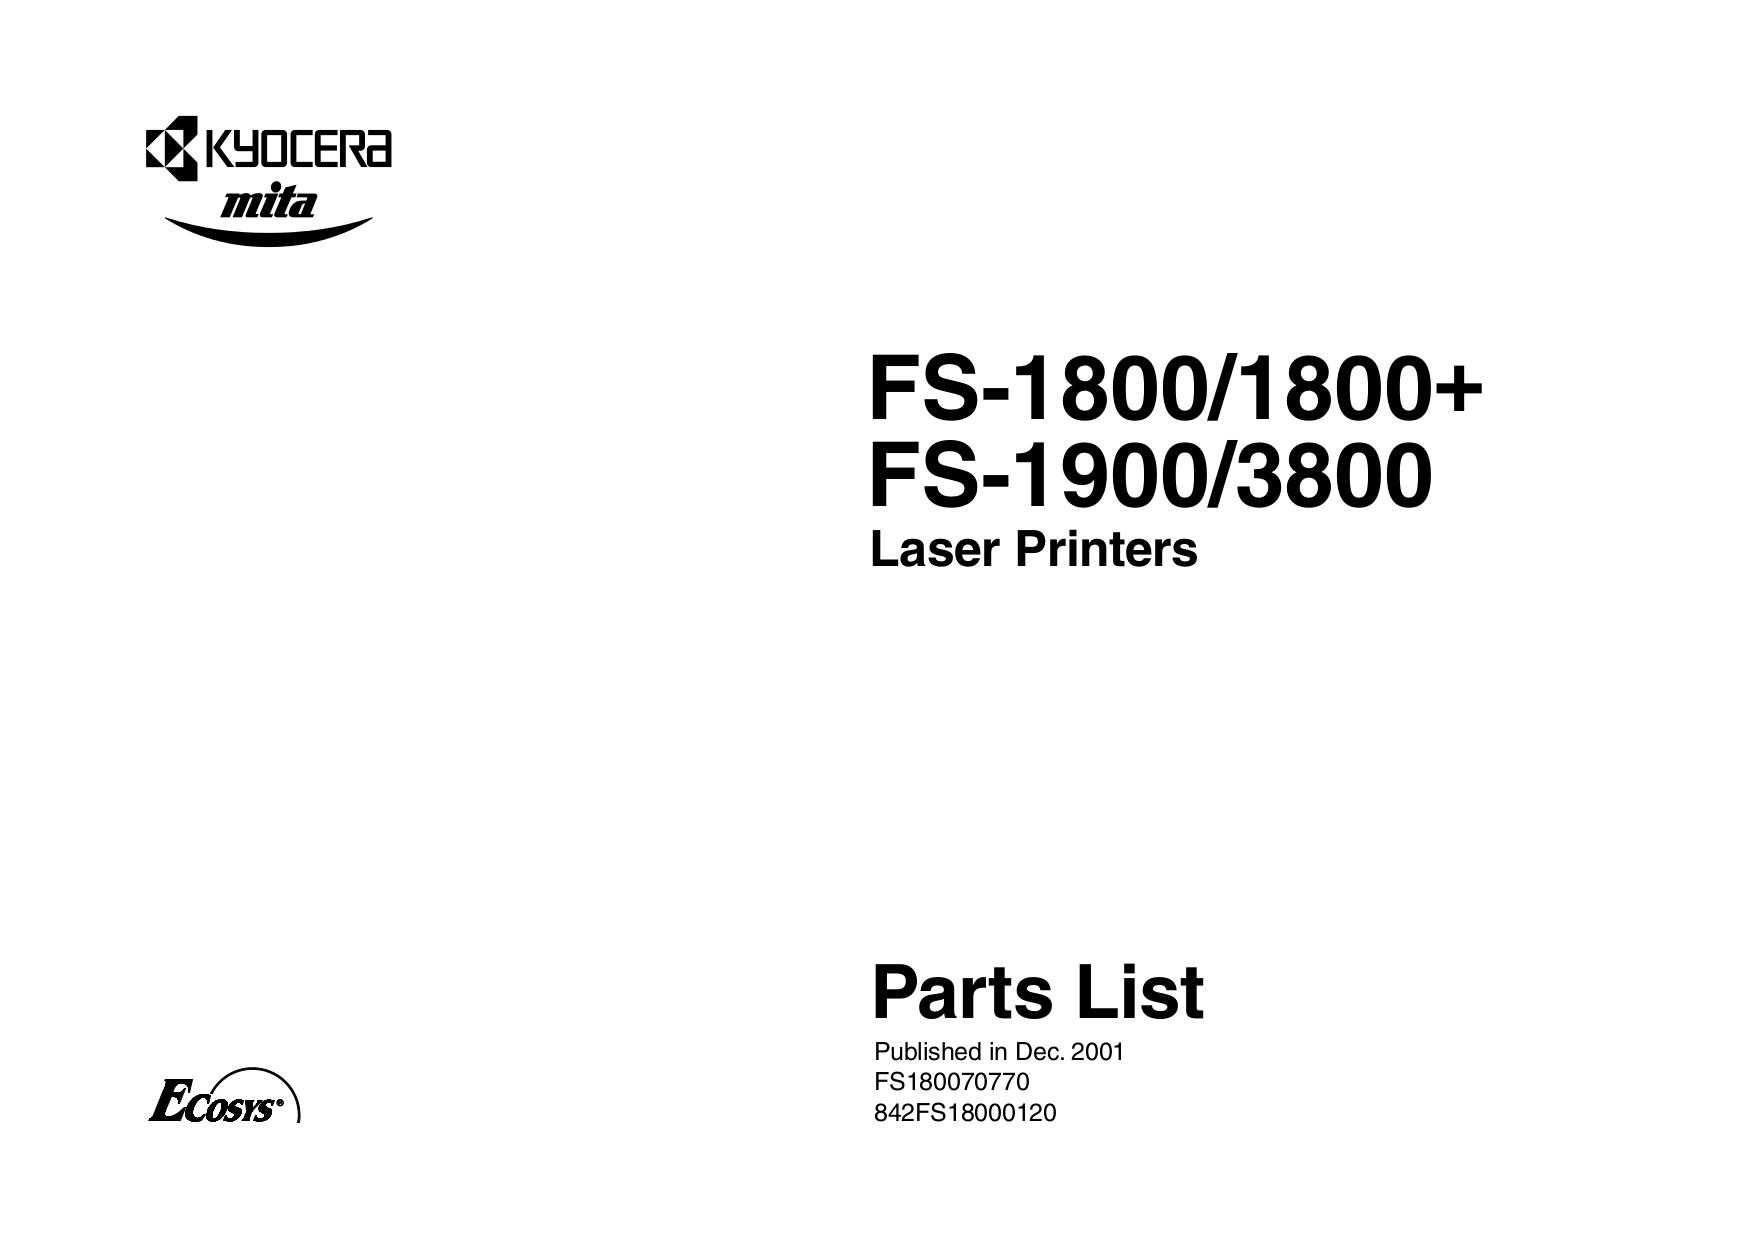 Download free pdf for Kyocera FS-3800 Printer manual